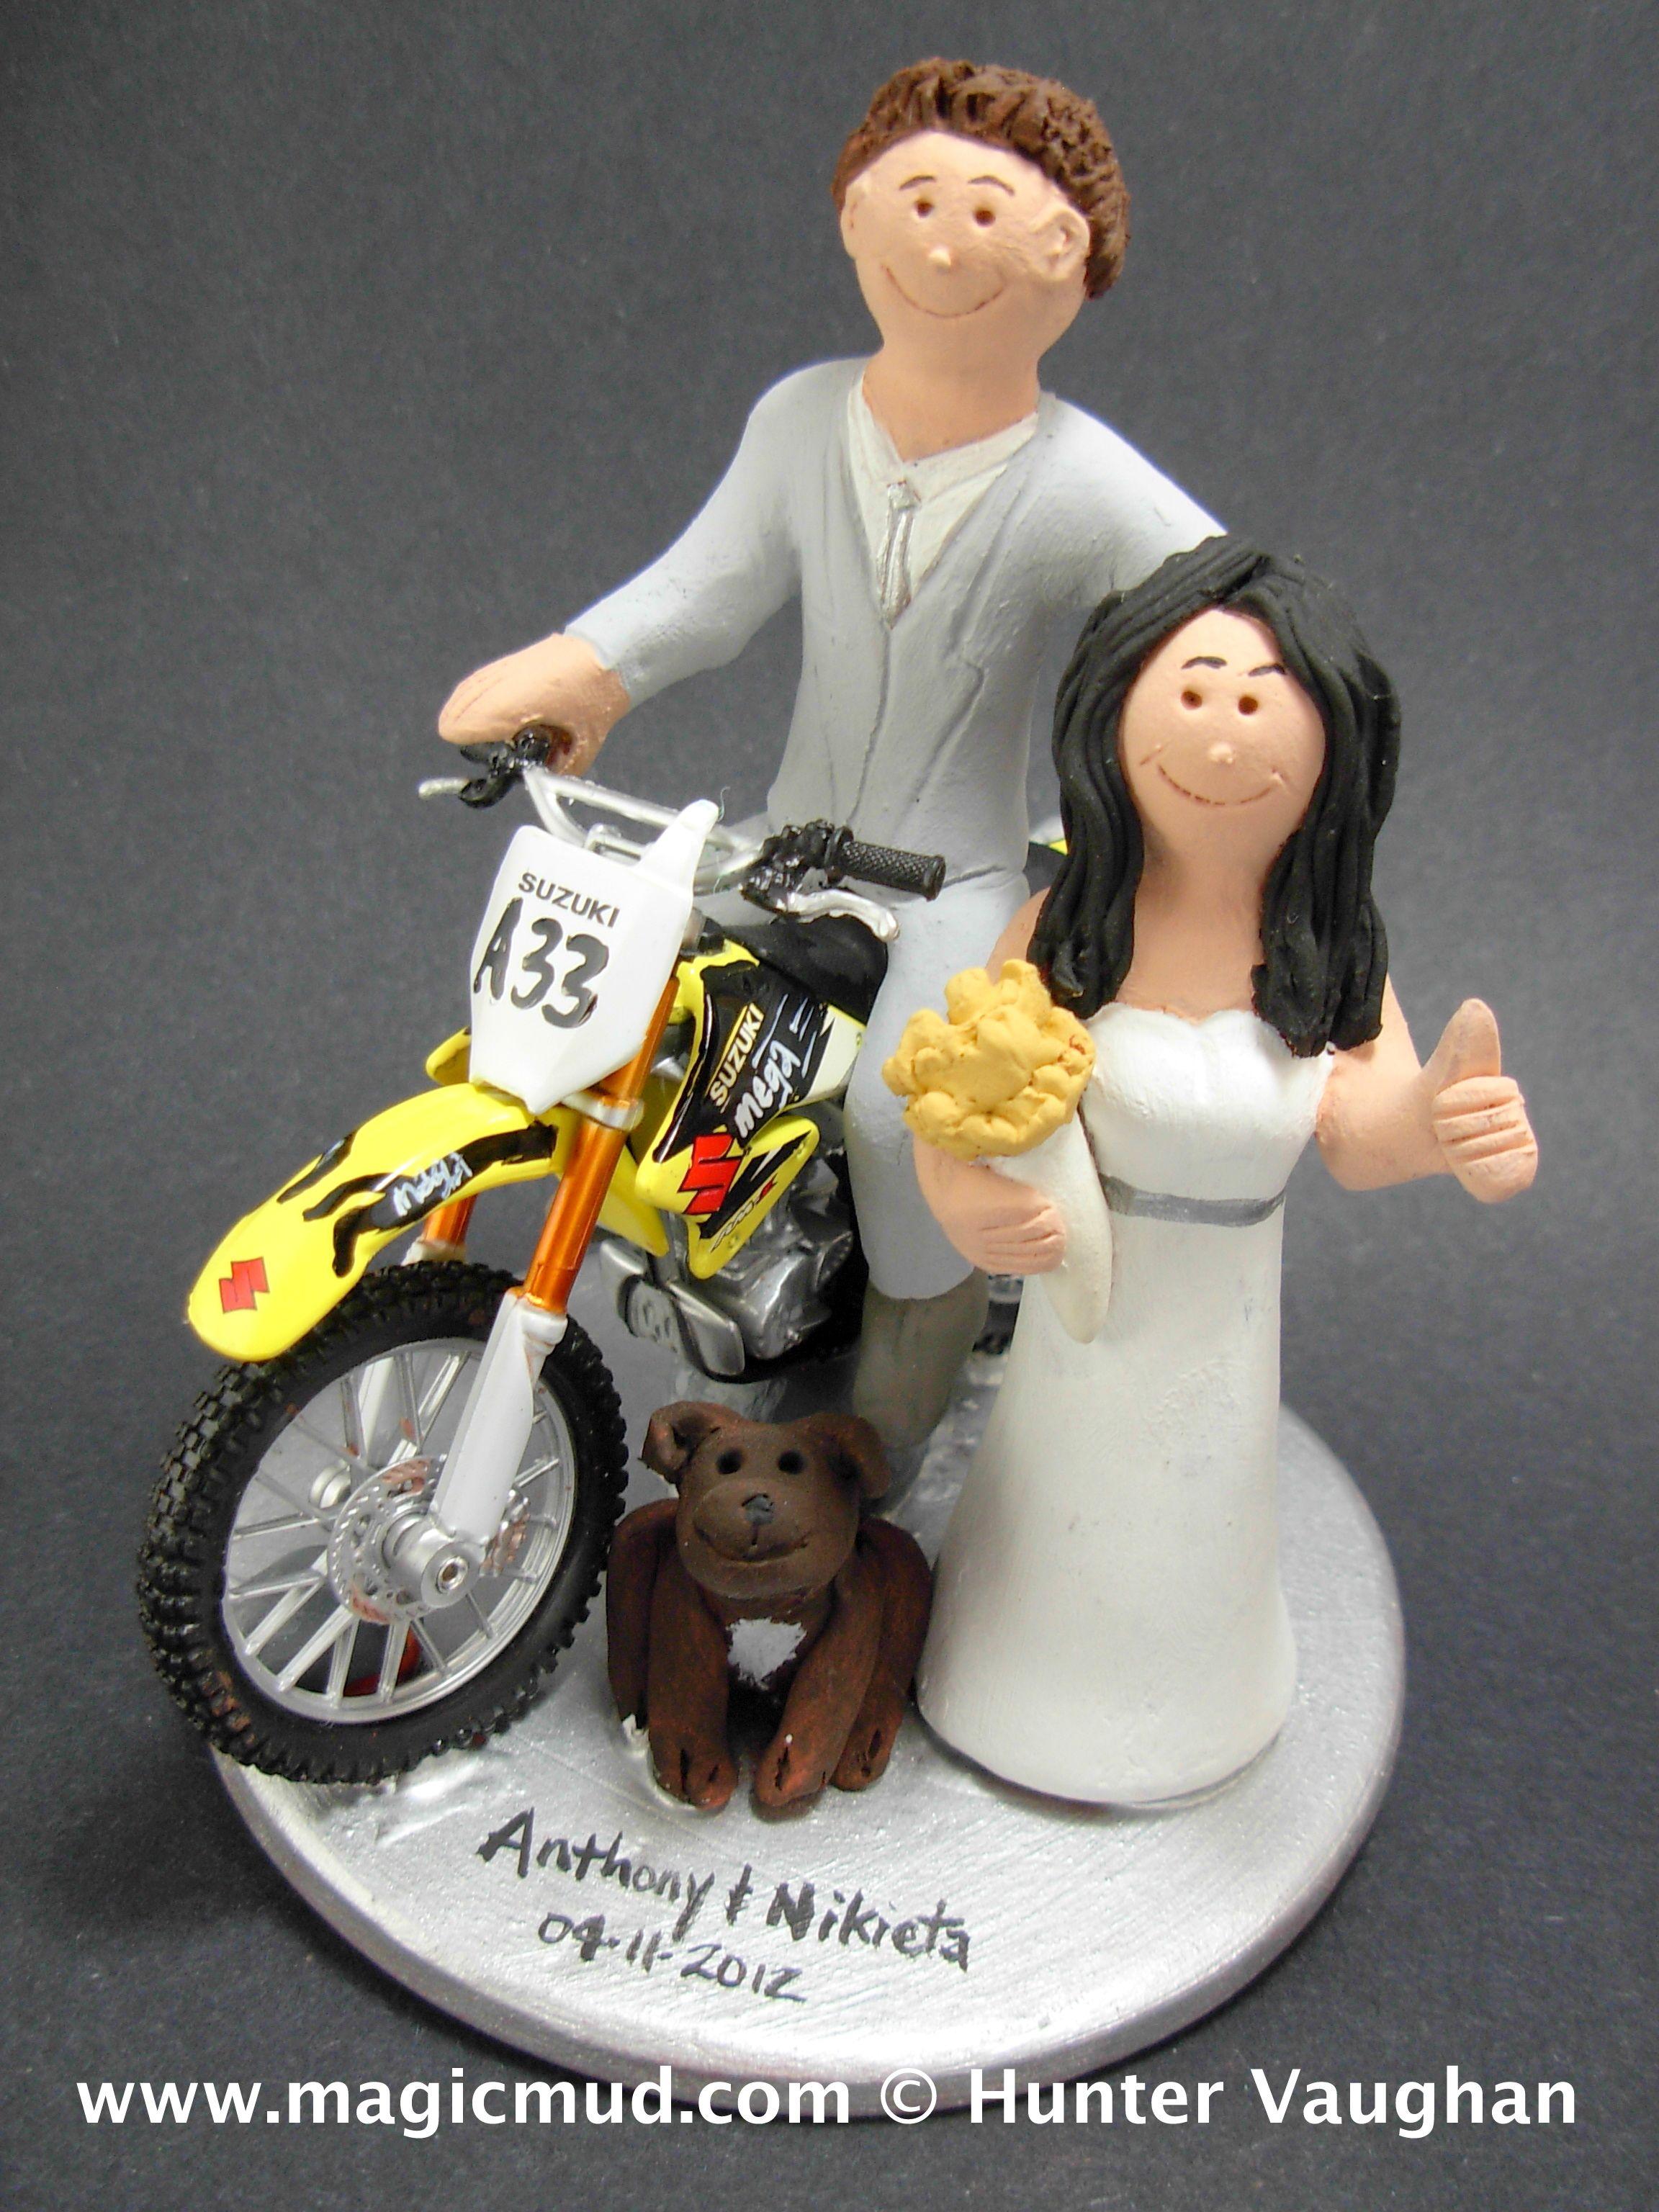 Suzuki Dirt Bikers Wedding Cake Topper 1 800 231 9814